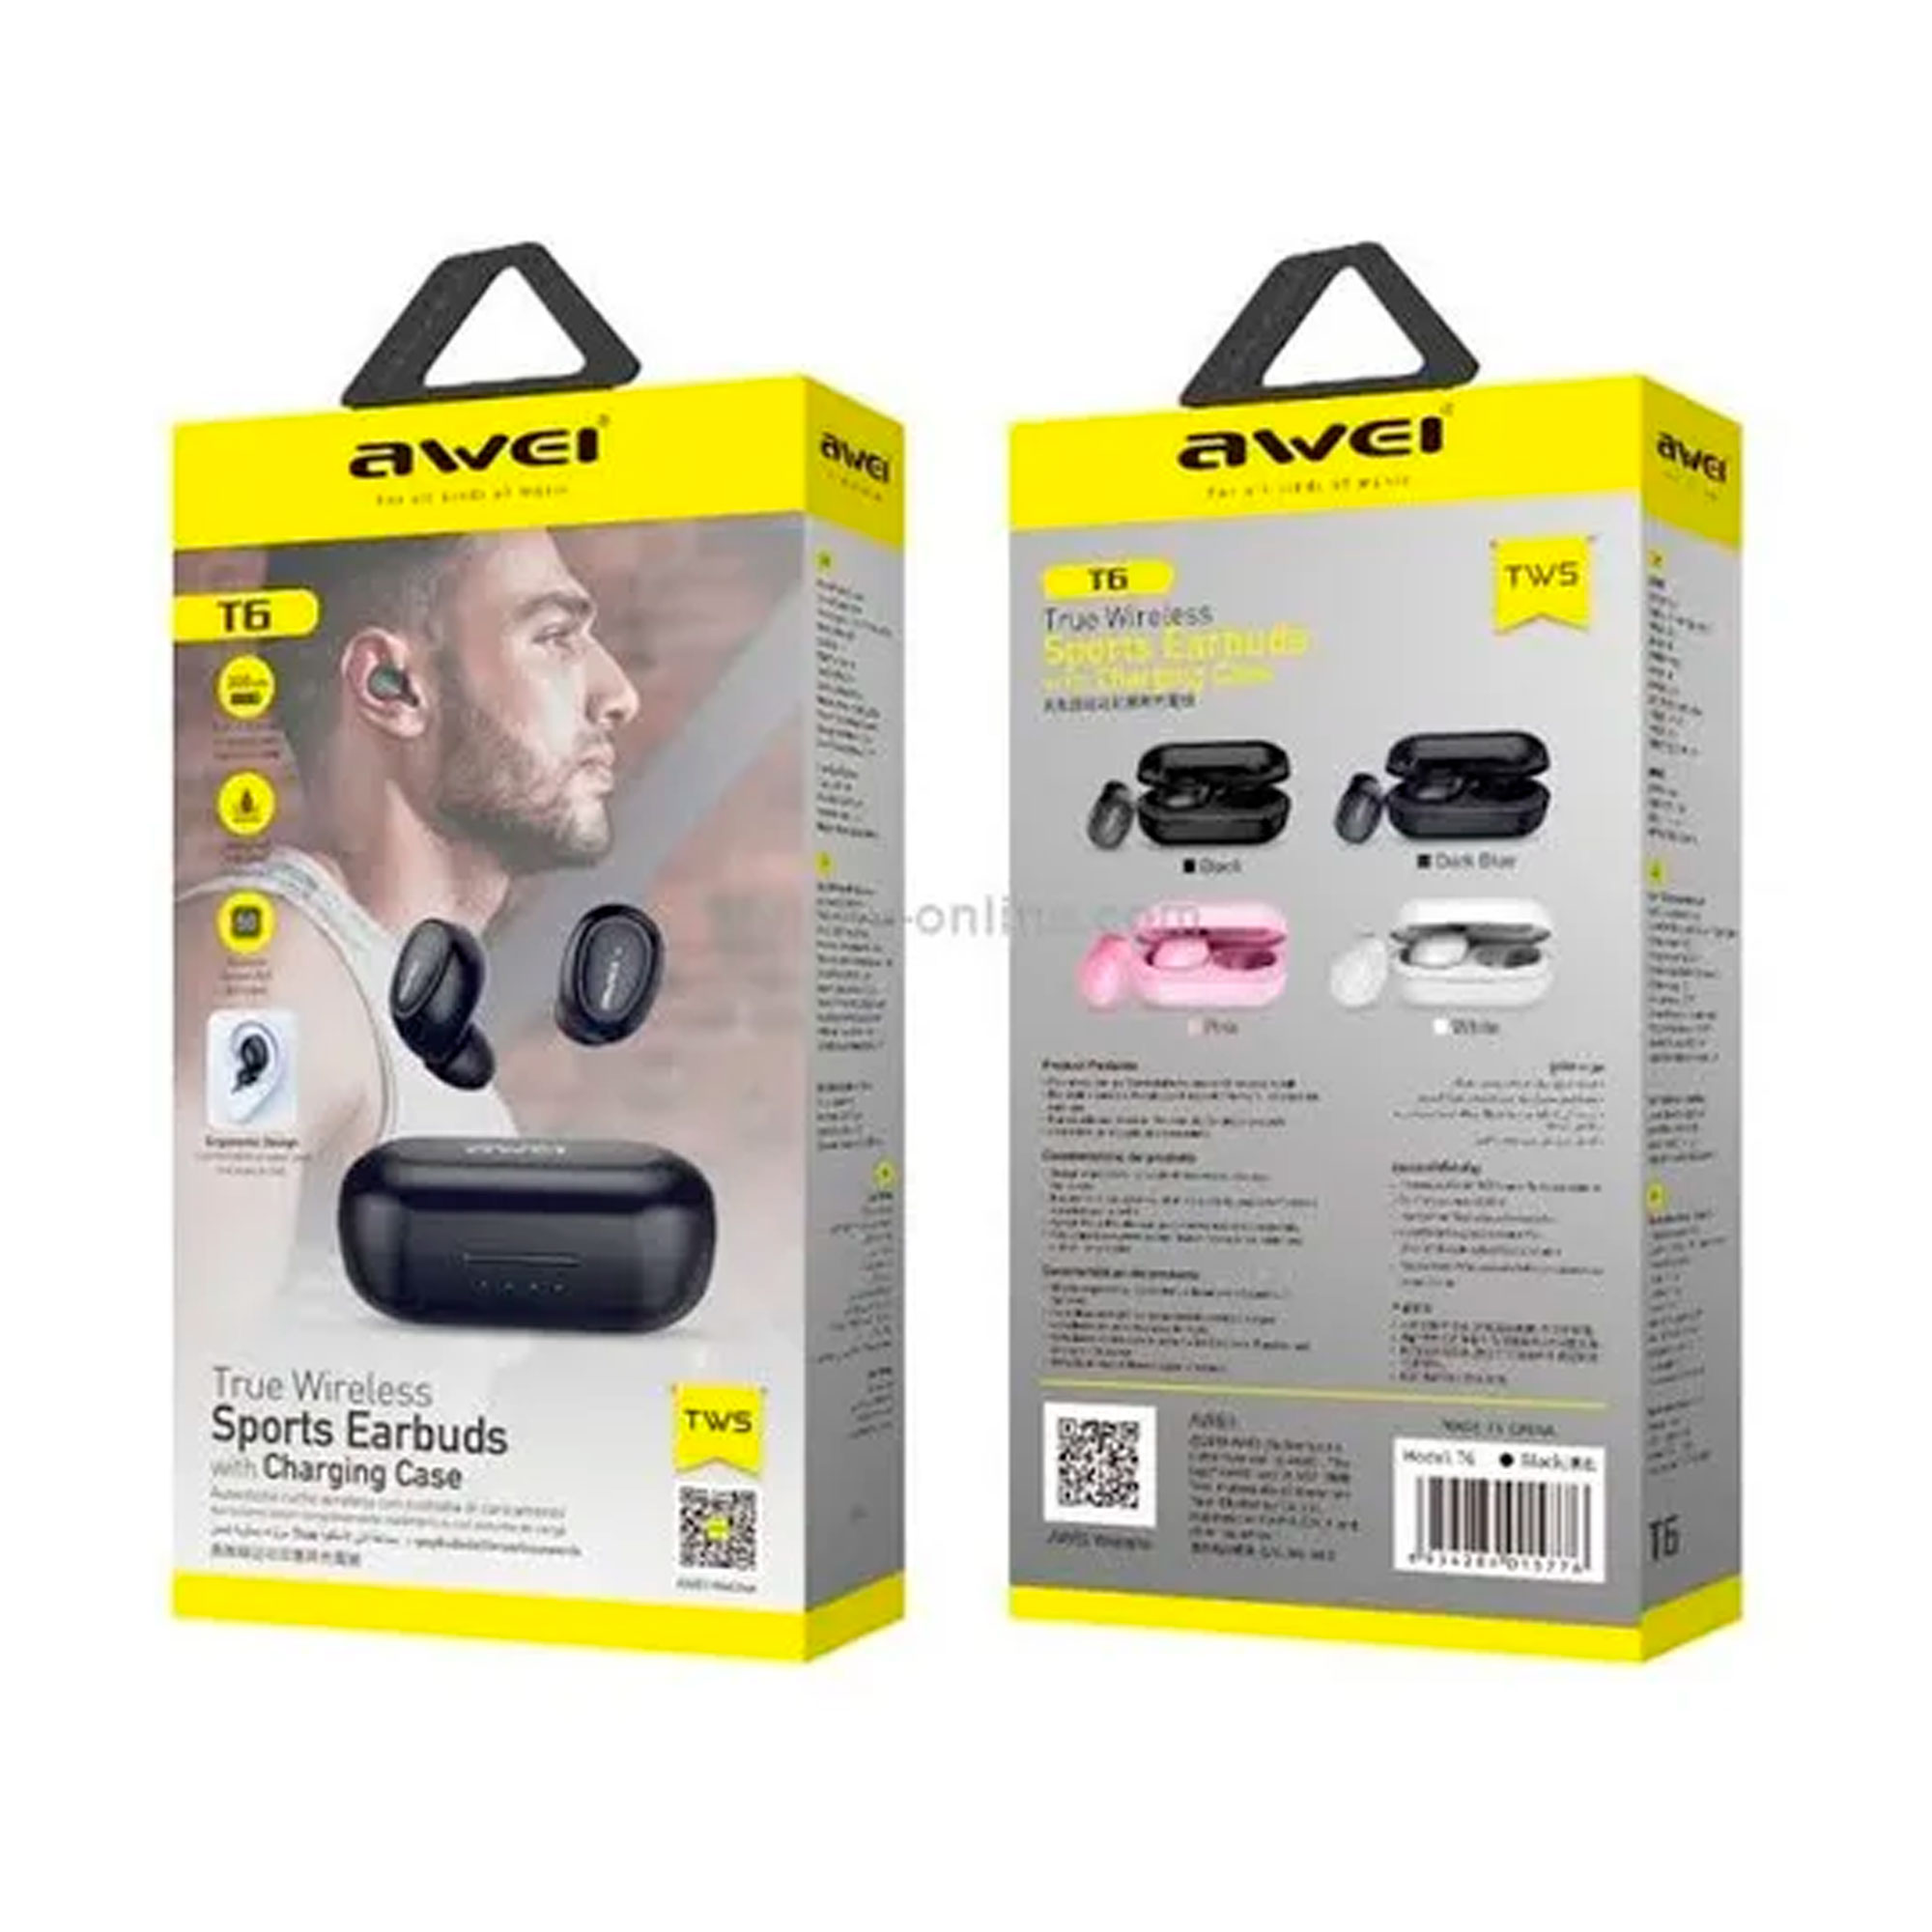 Fone de Ouvido Sem Fio Awei T6 Sports Earbuds Bluetooth